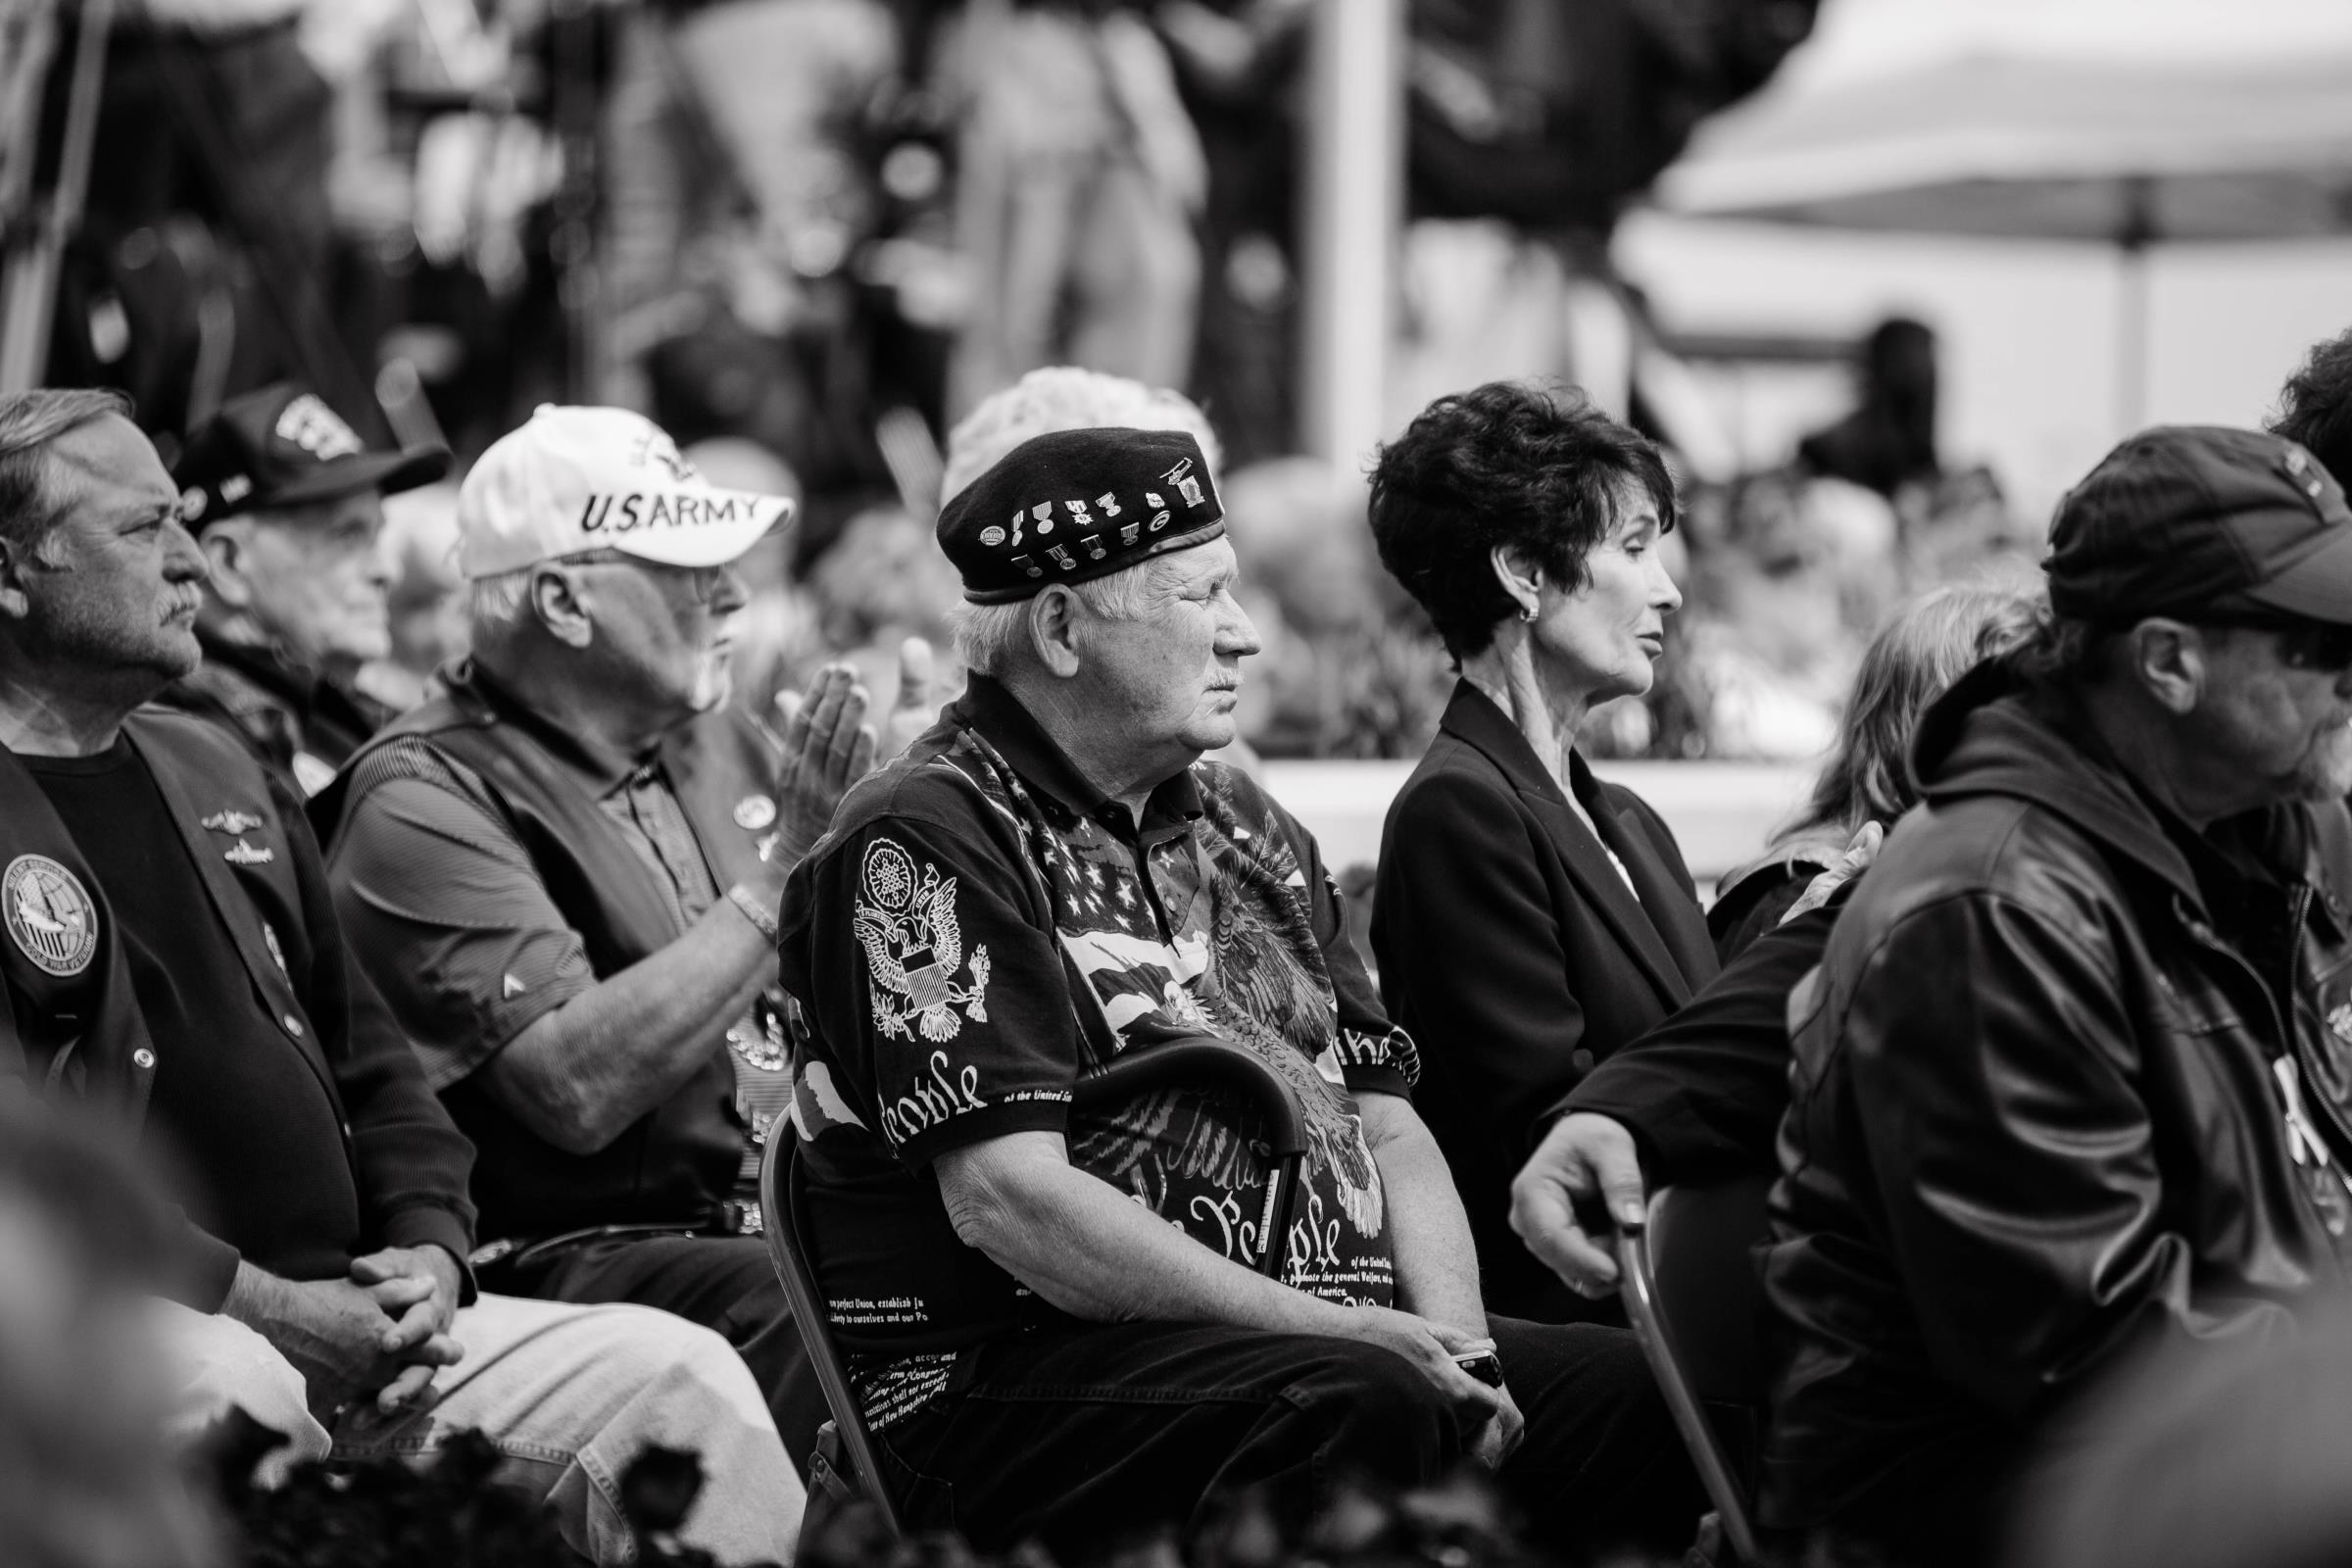 Veterans at the Vietnam Memorial dedication